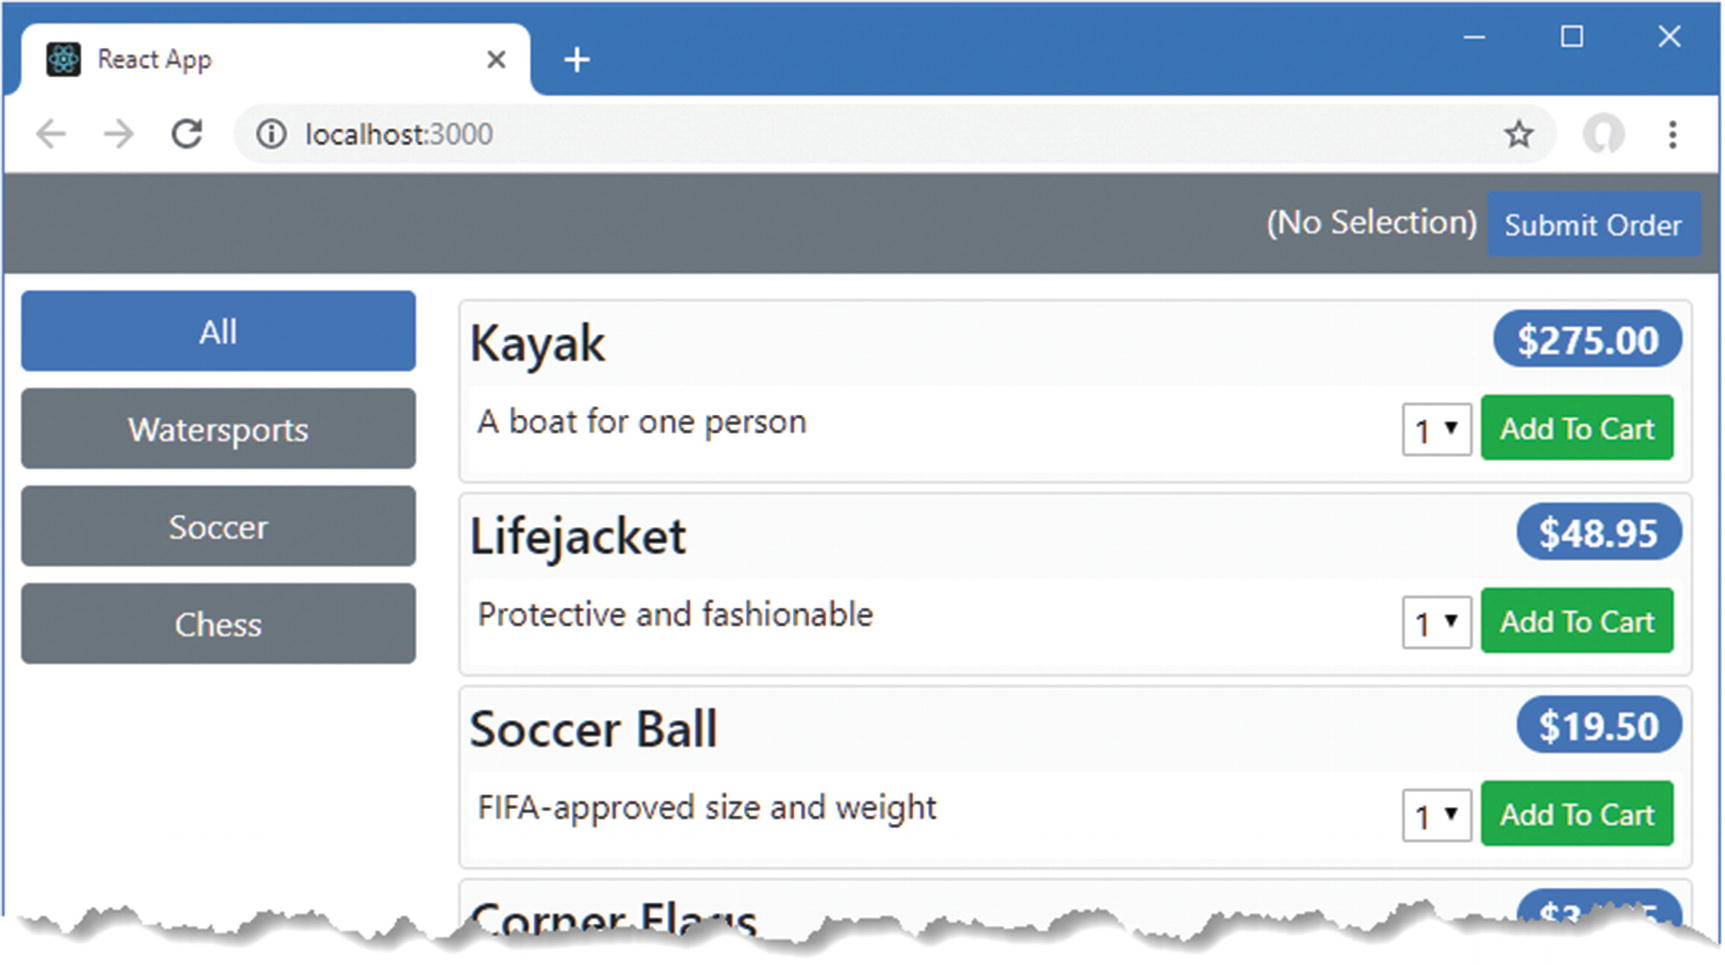 Creating a React App | SpringerLink